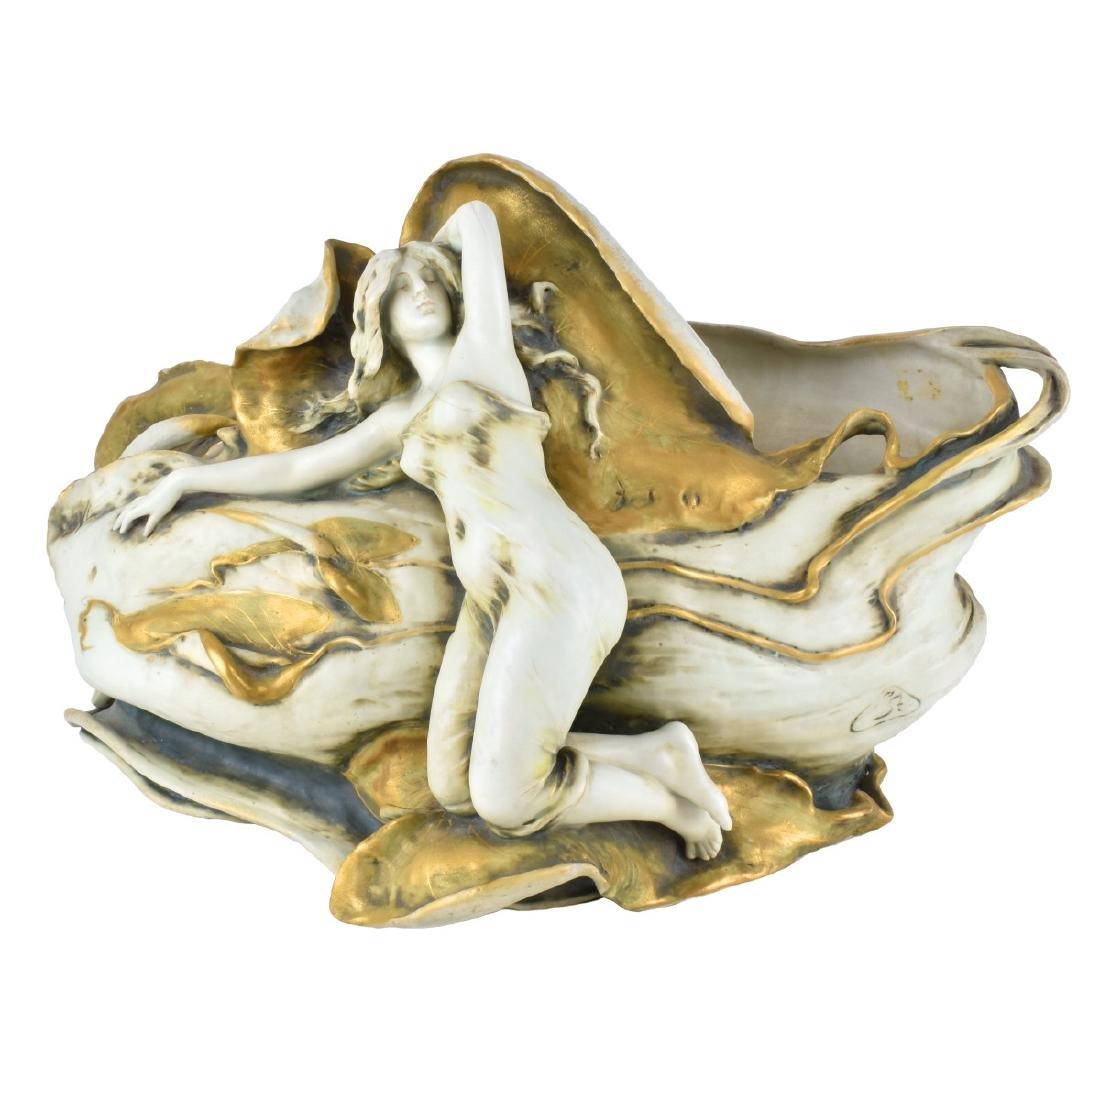 Turn Teplitz Amphora Figural Porcelain Centerpiece